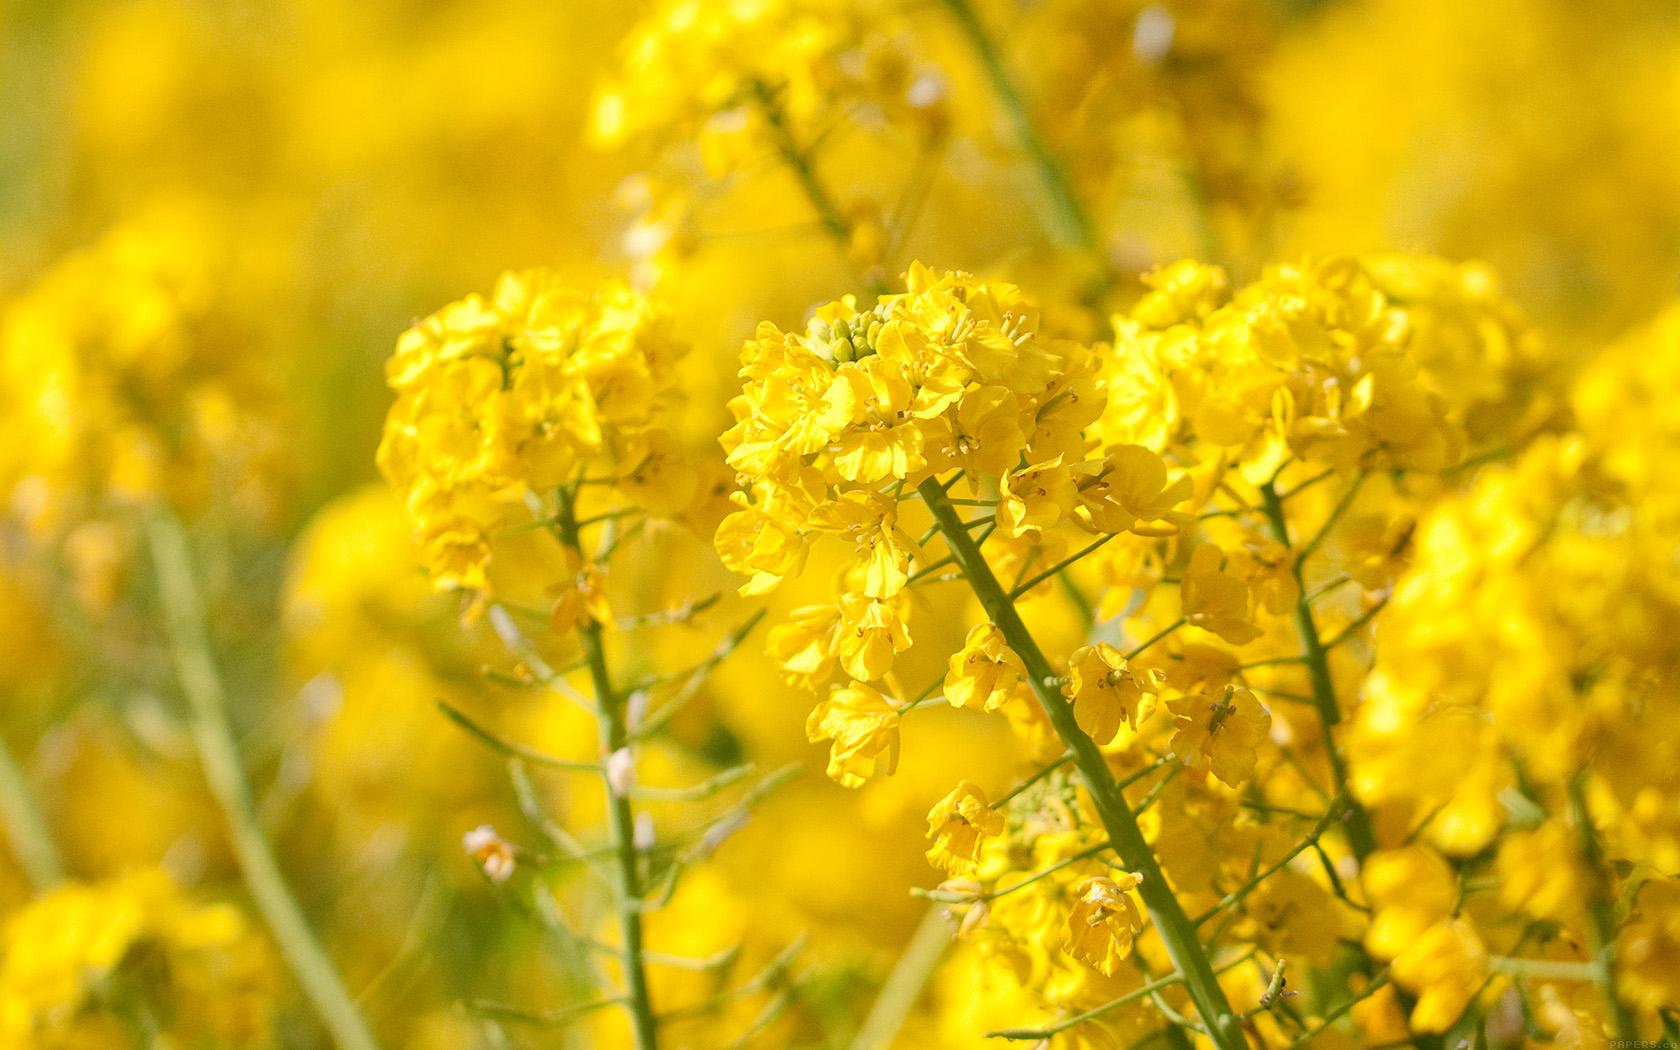 wallpaper for desktop, laptop | mq16-yellow-flower-spring ...